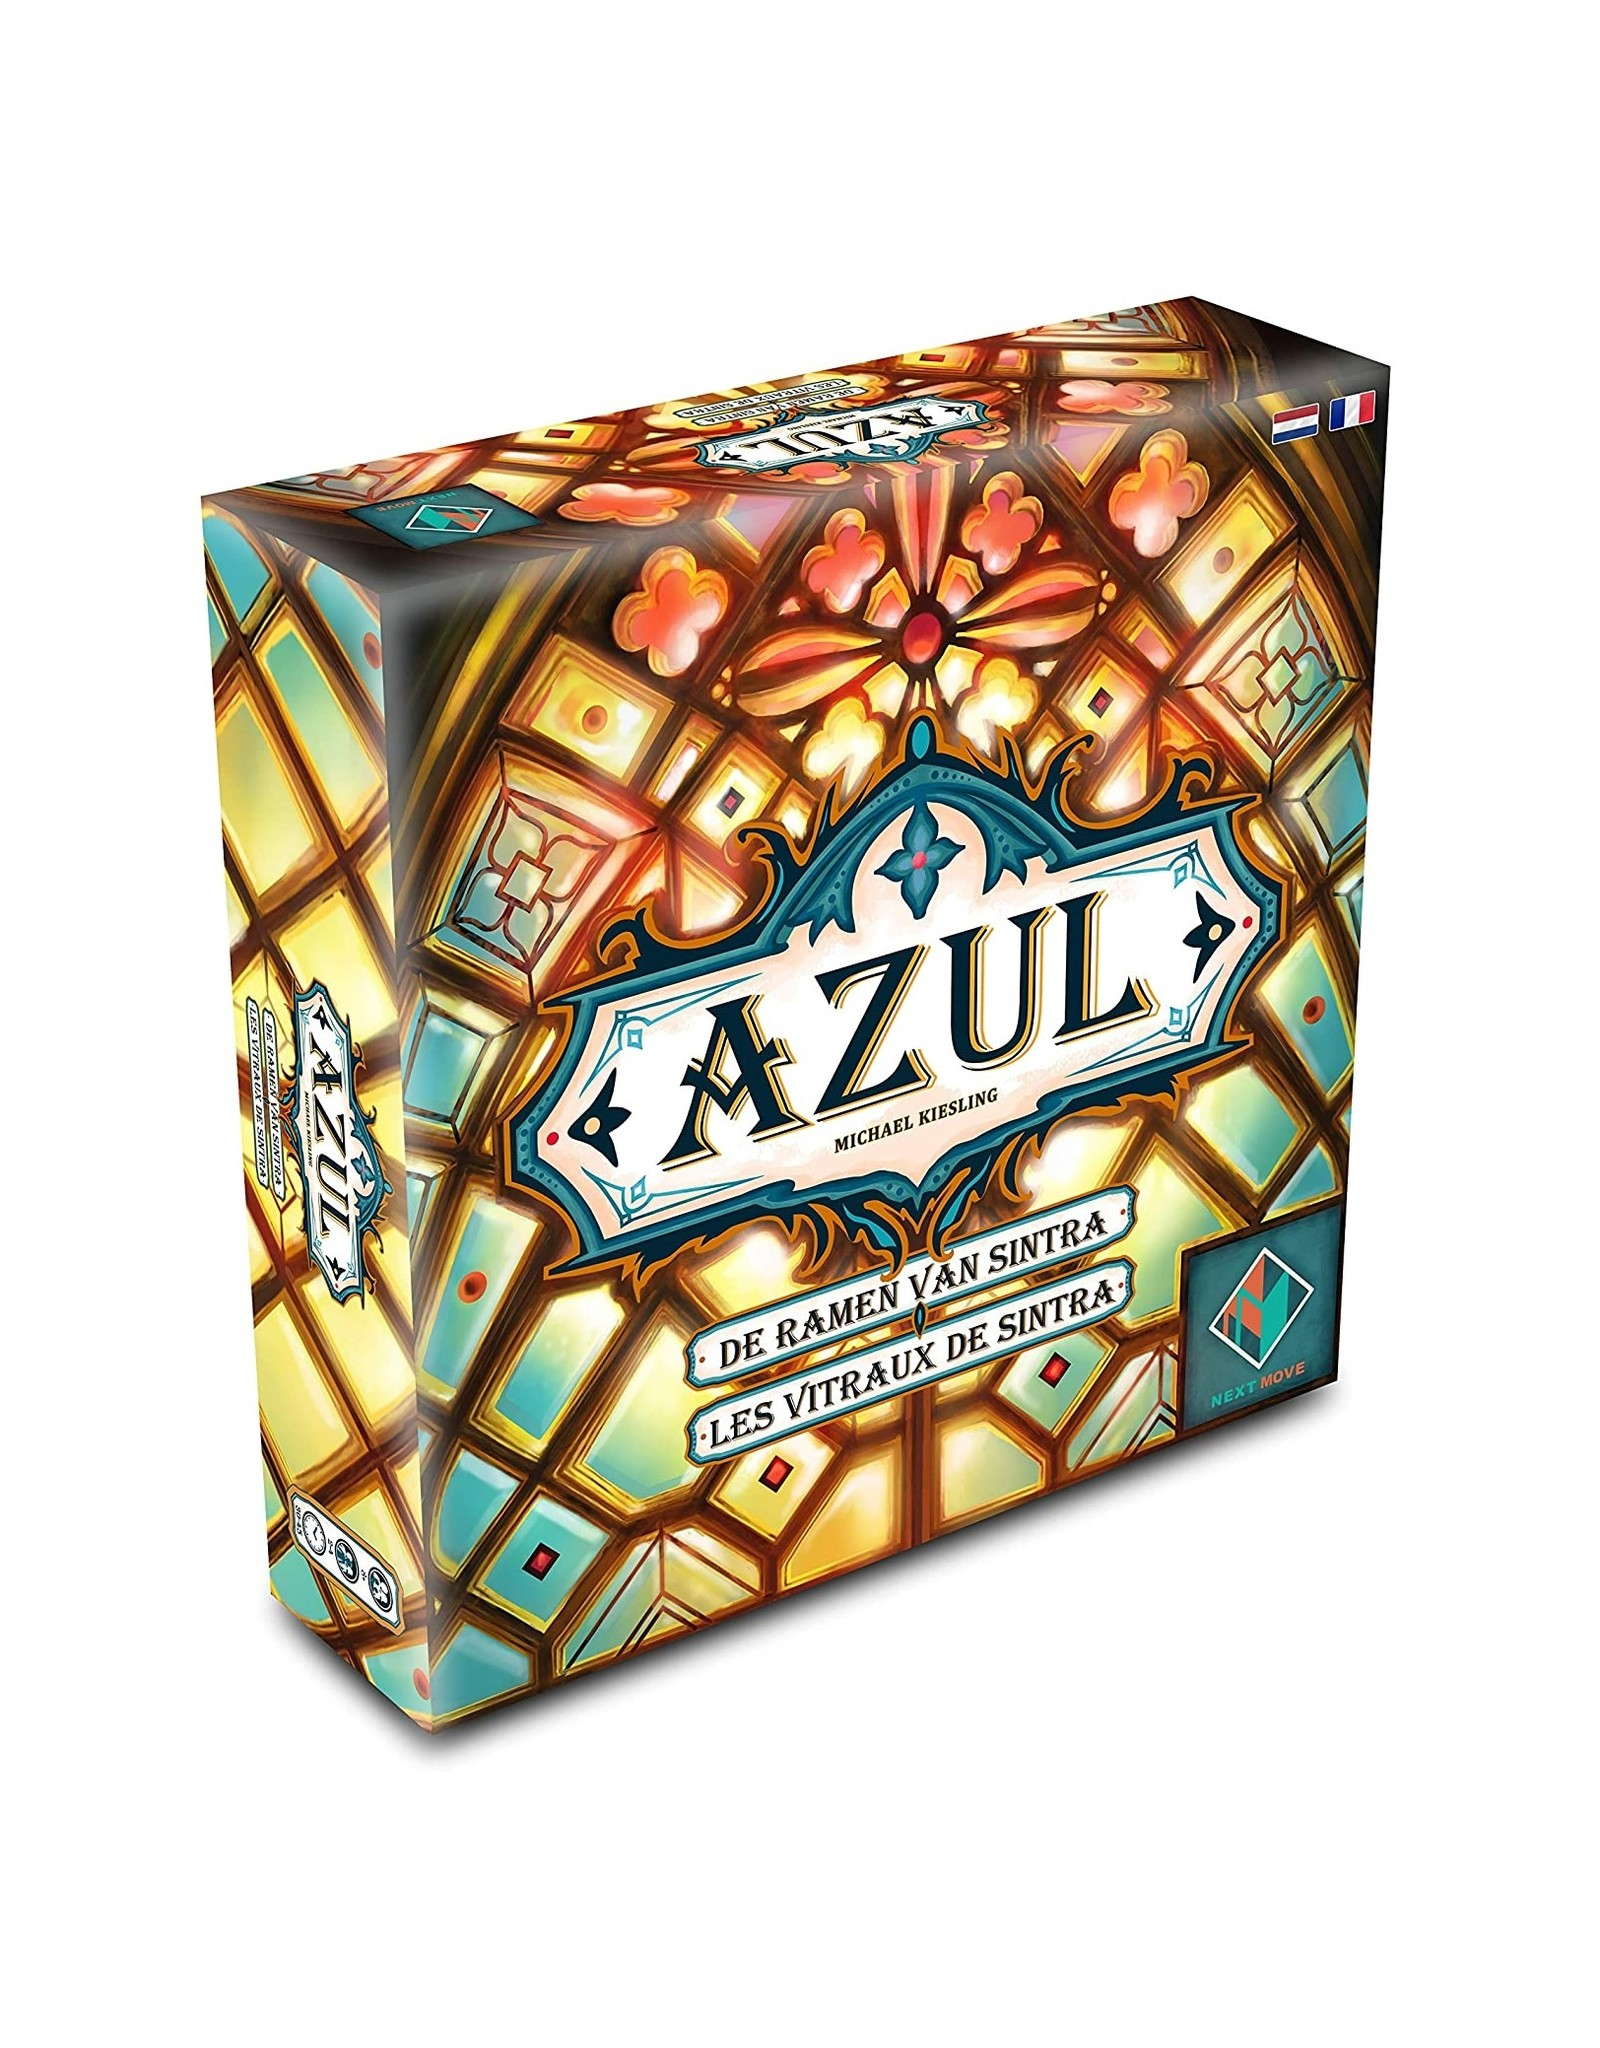 Azul - De Ramen van Sintra - Bordspel